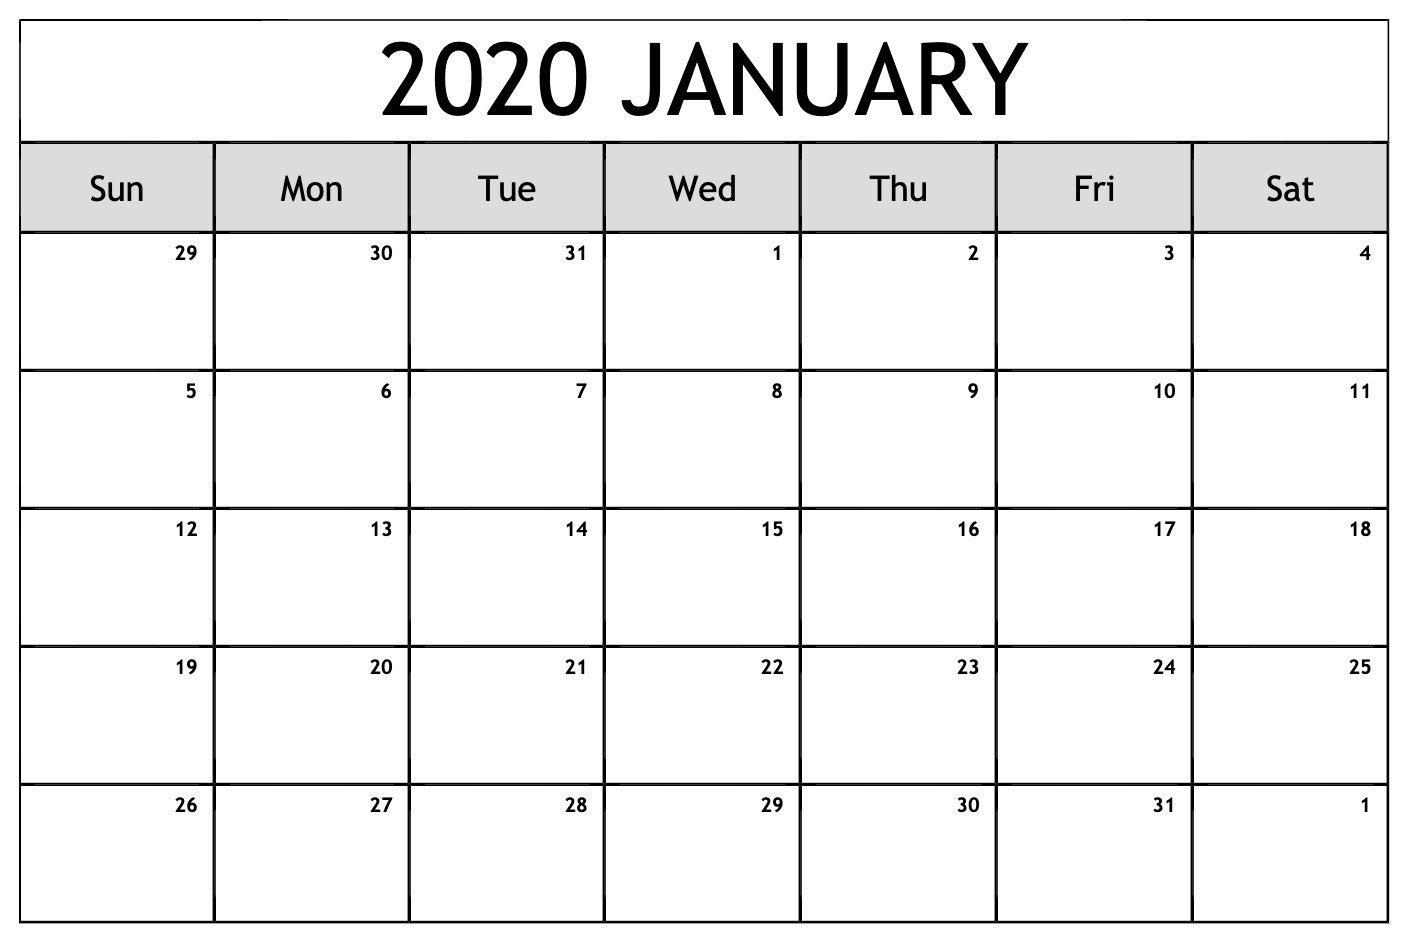 2020 Calendar You Can Edit | Calendar Printables Free Calender You Cann Edit With Holidays On It